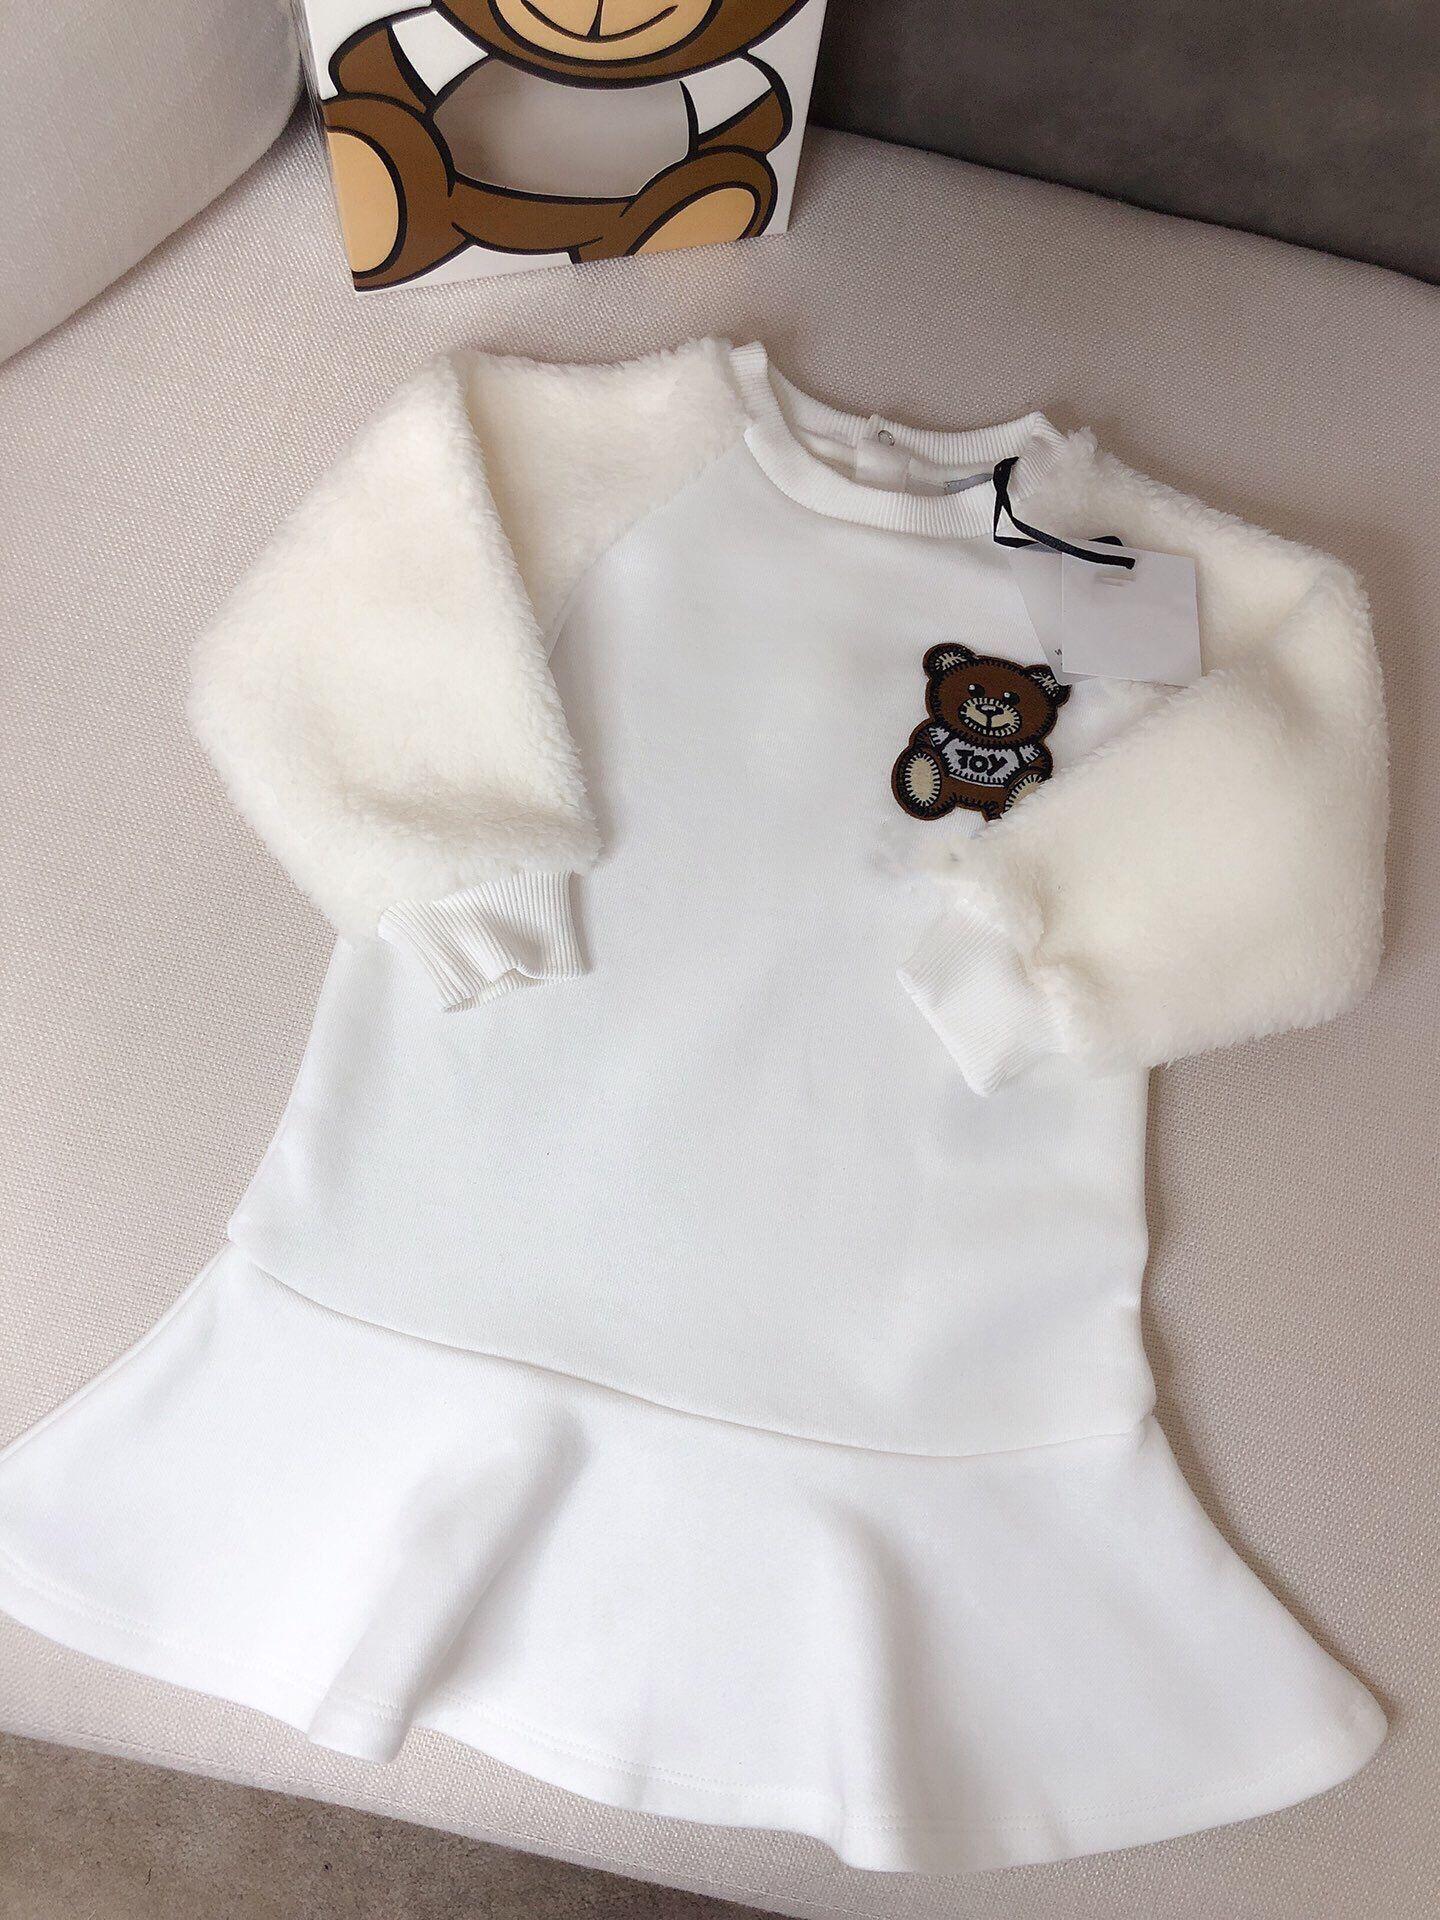 Baby Girls Winter Dress Long Sleeve Sweater Knit Christmas Toddler Casual Warm Dress Chiffon Xmas Children Clothing